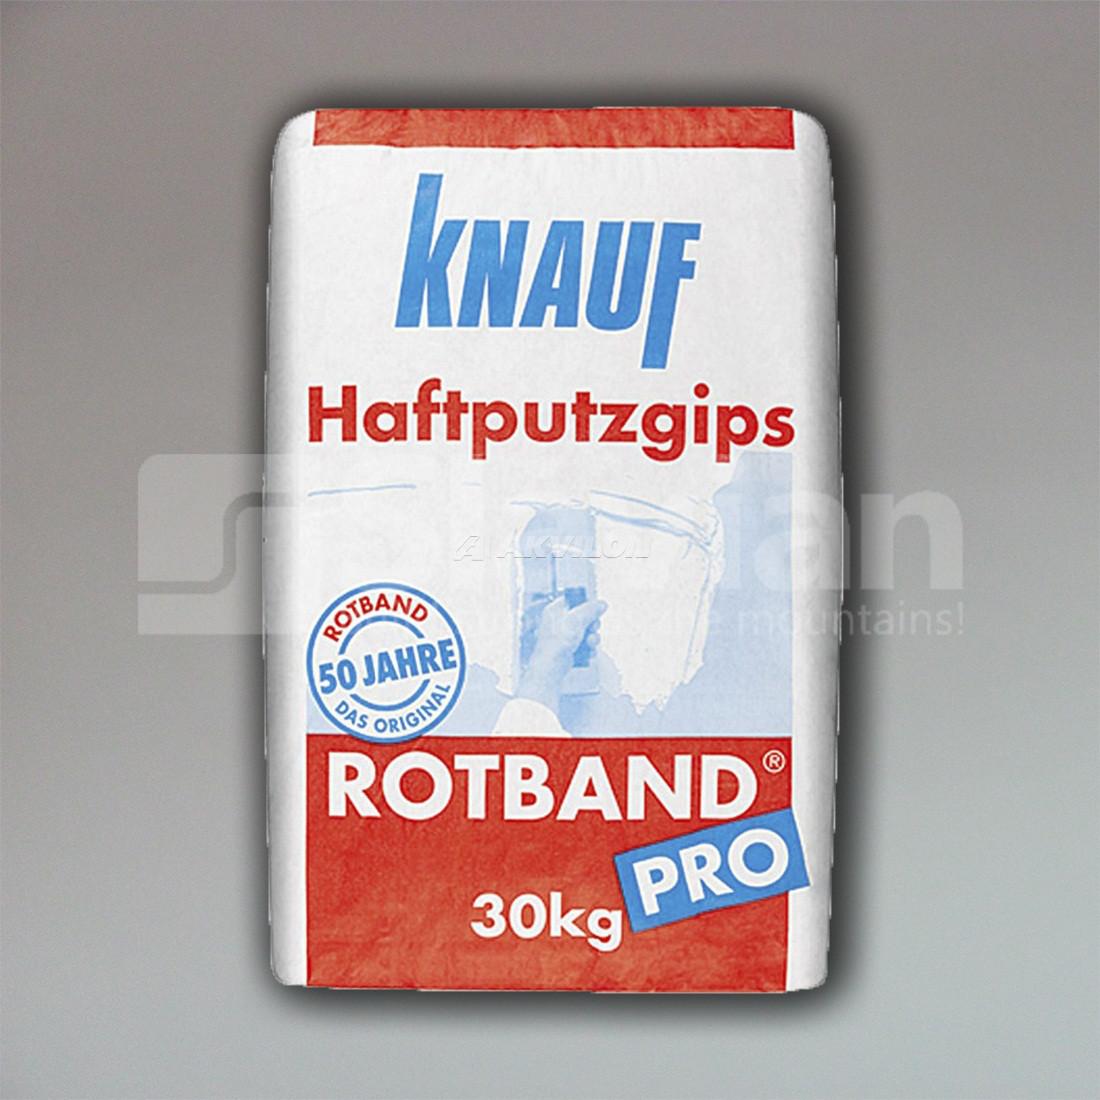 Штукатурка гипсовая универсальная knauf rotband pro, 30кг, цена 142